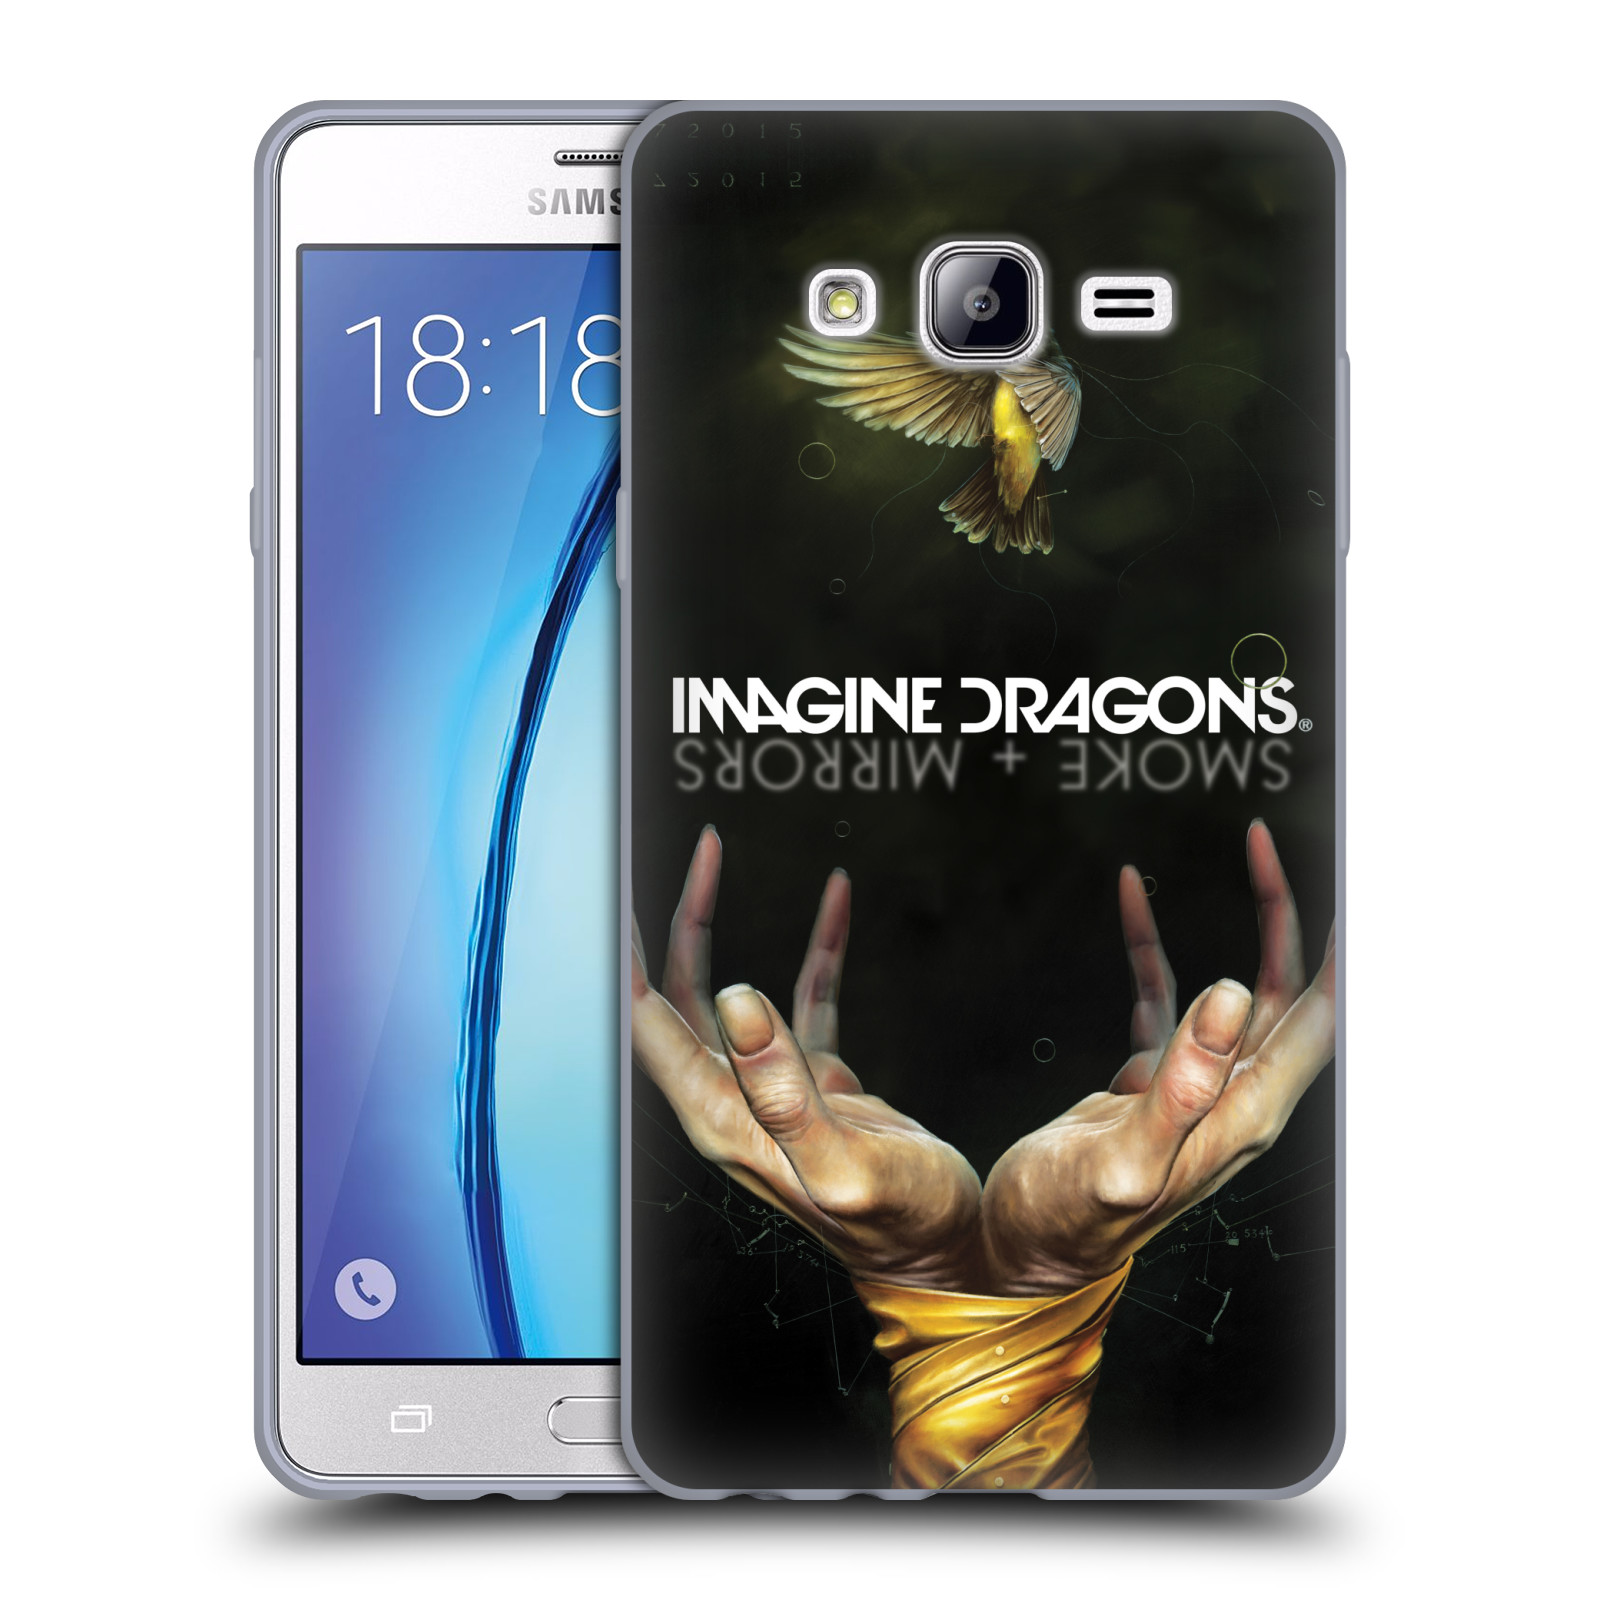 HEAD CASE silikonový obal na mobil Samsung Galaxy On7 hudební skupina Imagine Dragons SMOKE and MIRRORS